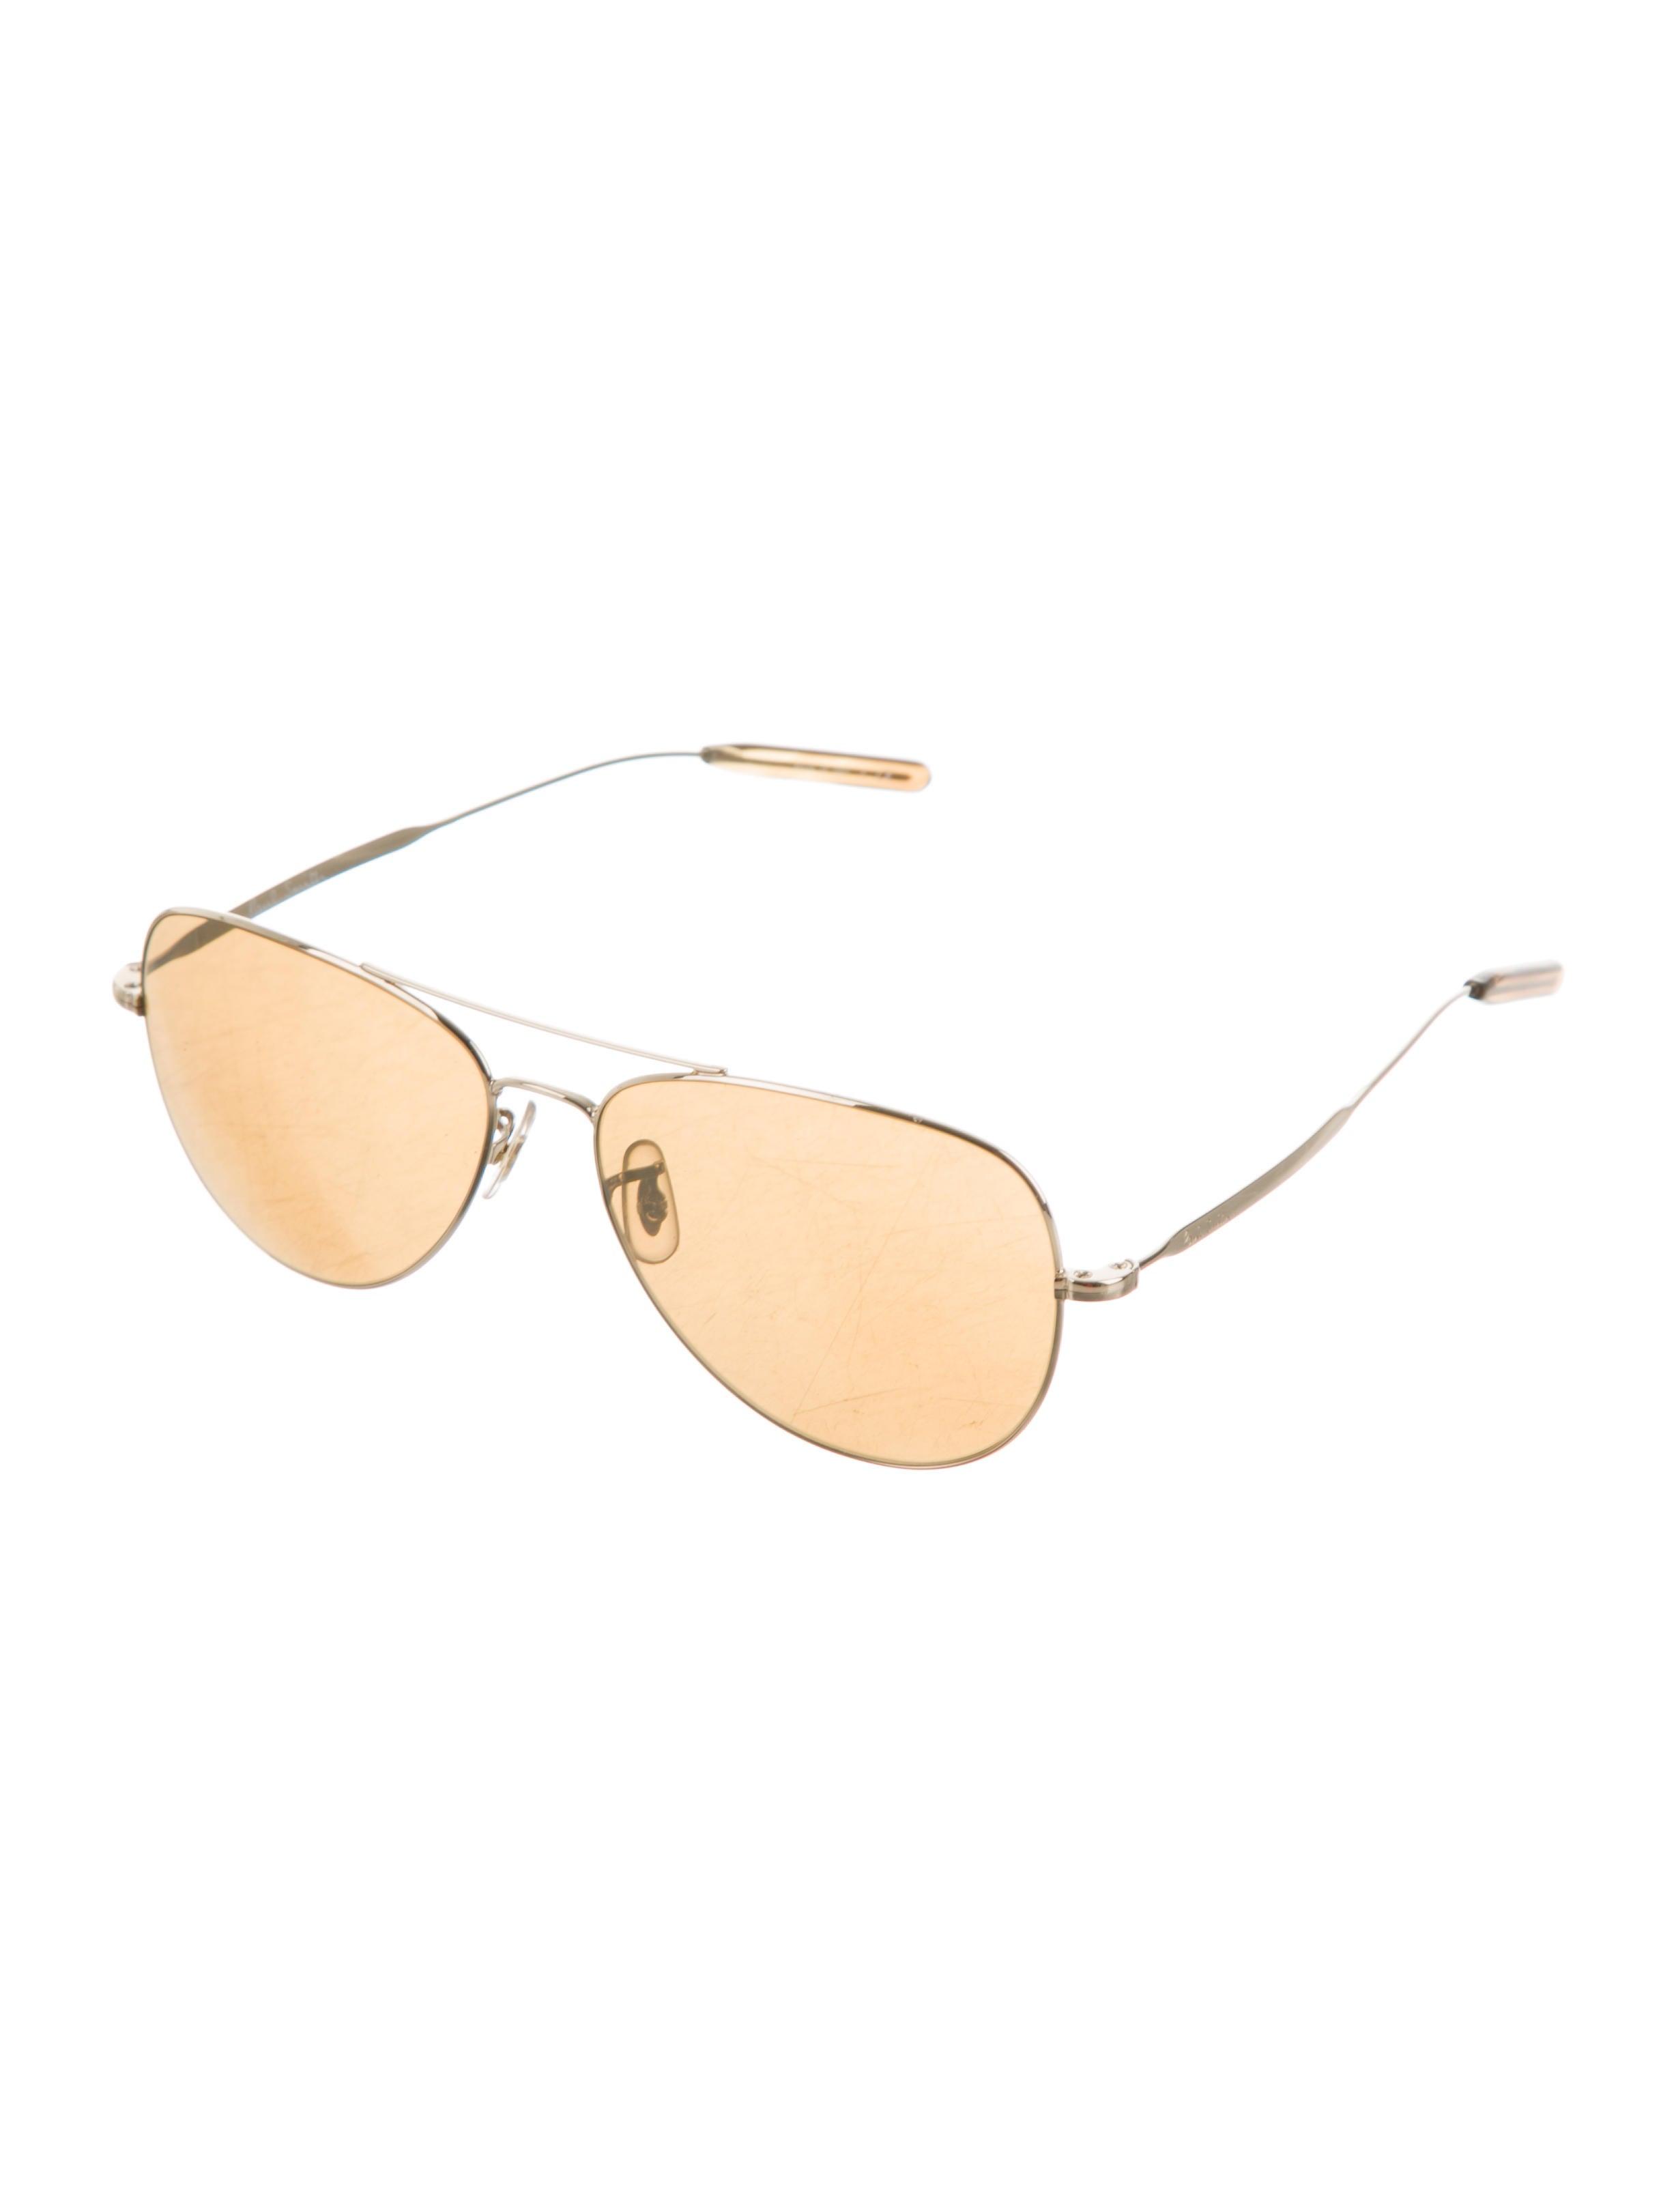 3b3ff8d3a1 Paul Smith Orsett Aviator Sunglasses